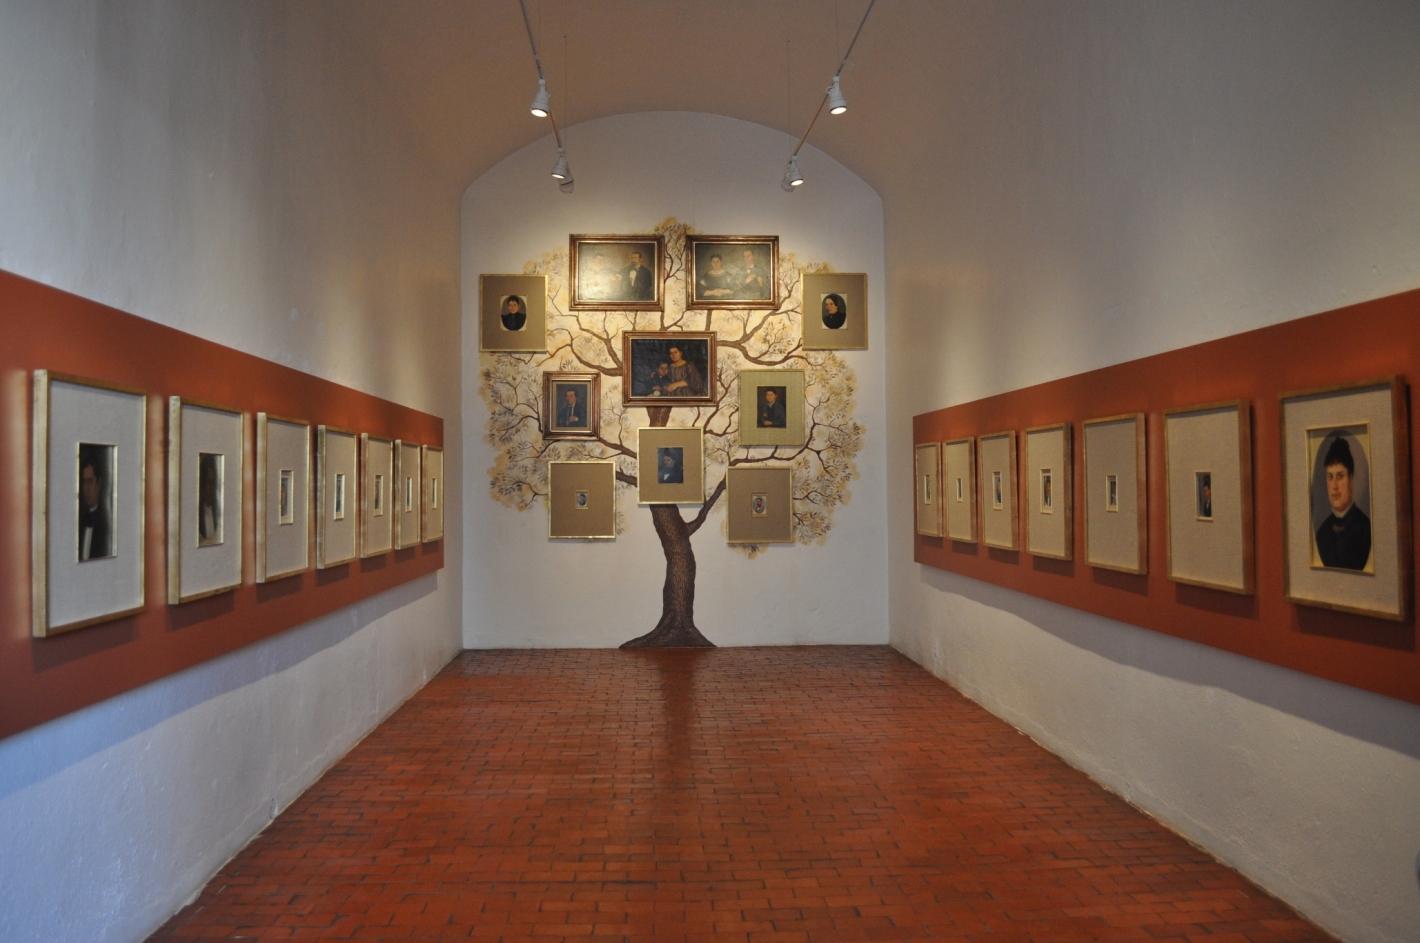 museos-de-guanajuato-alhondiga